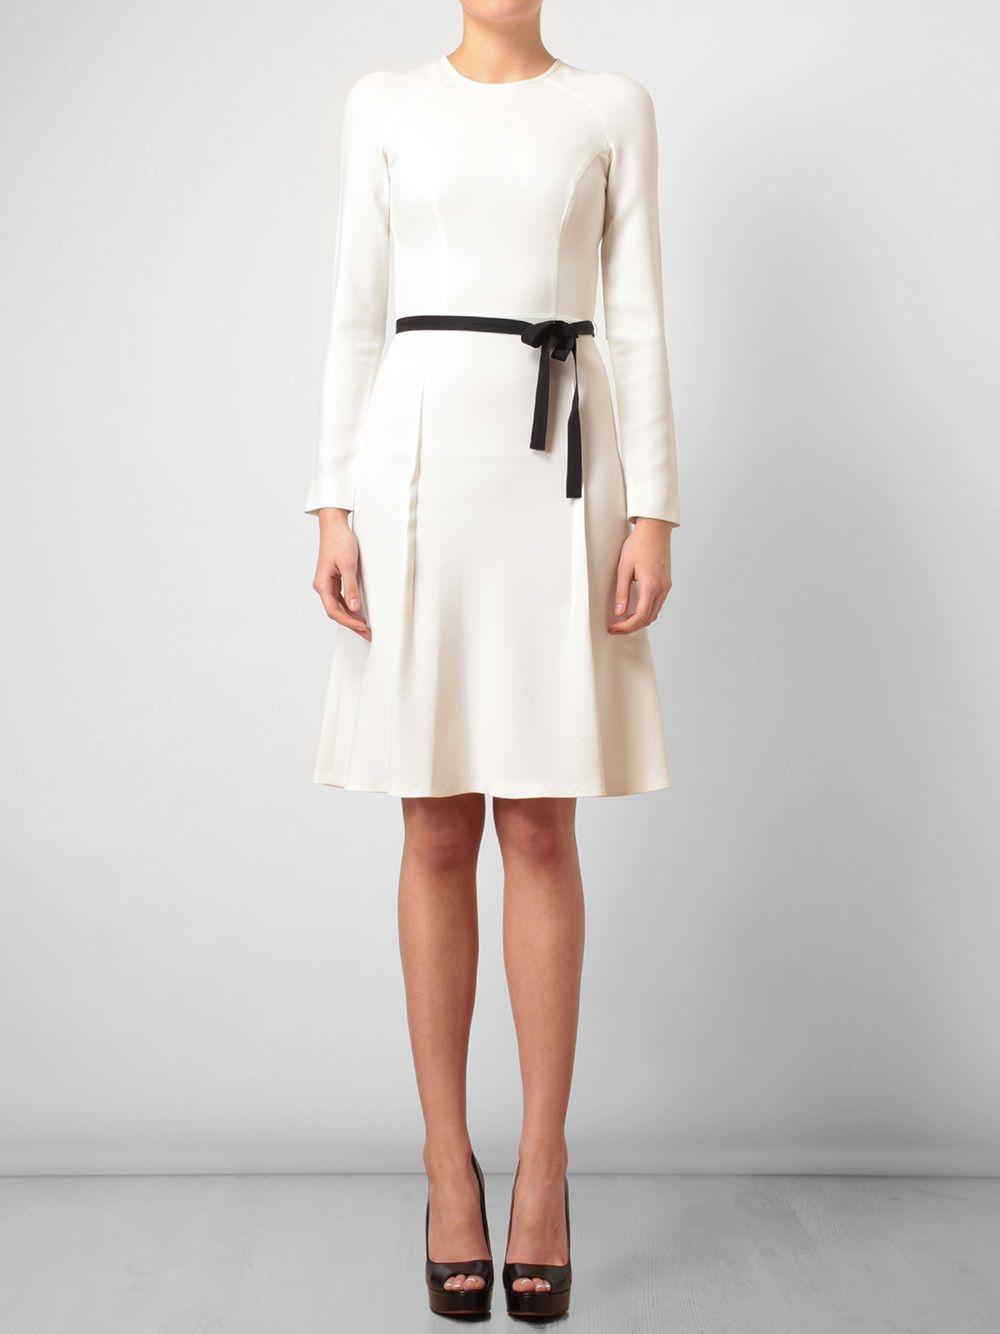 7e7a945d4a Roland Mouret Classic Crepe Dress in White (black) | Lyst | Belt it ...